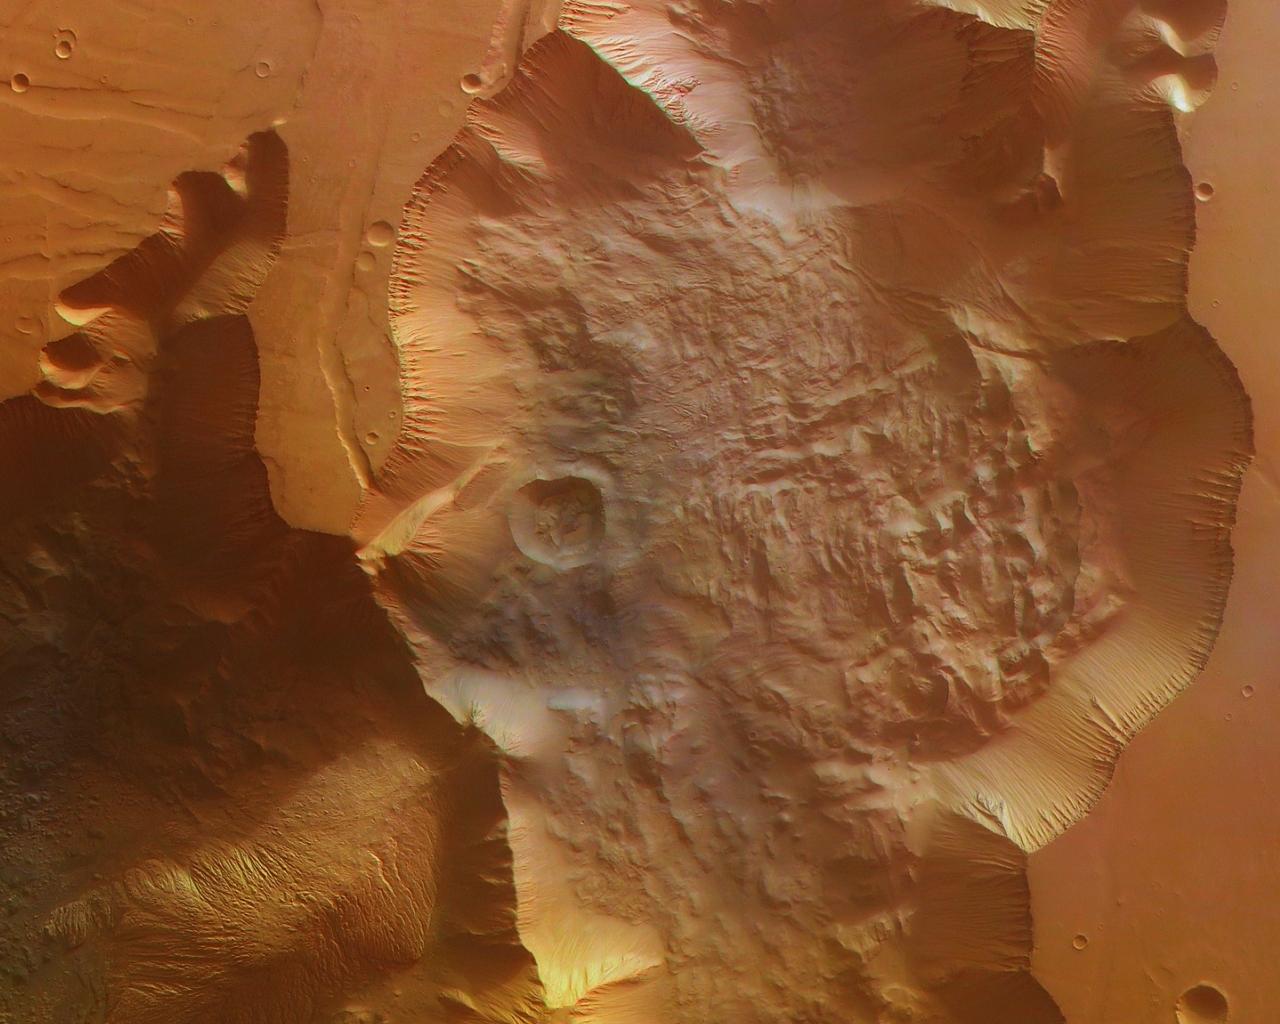 1567218096816-TithoniumChasma-wallpaper.jpg